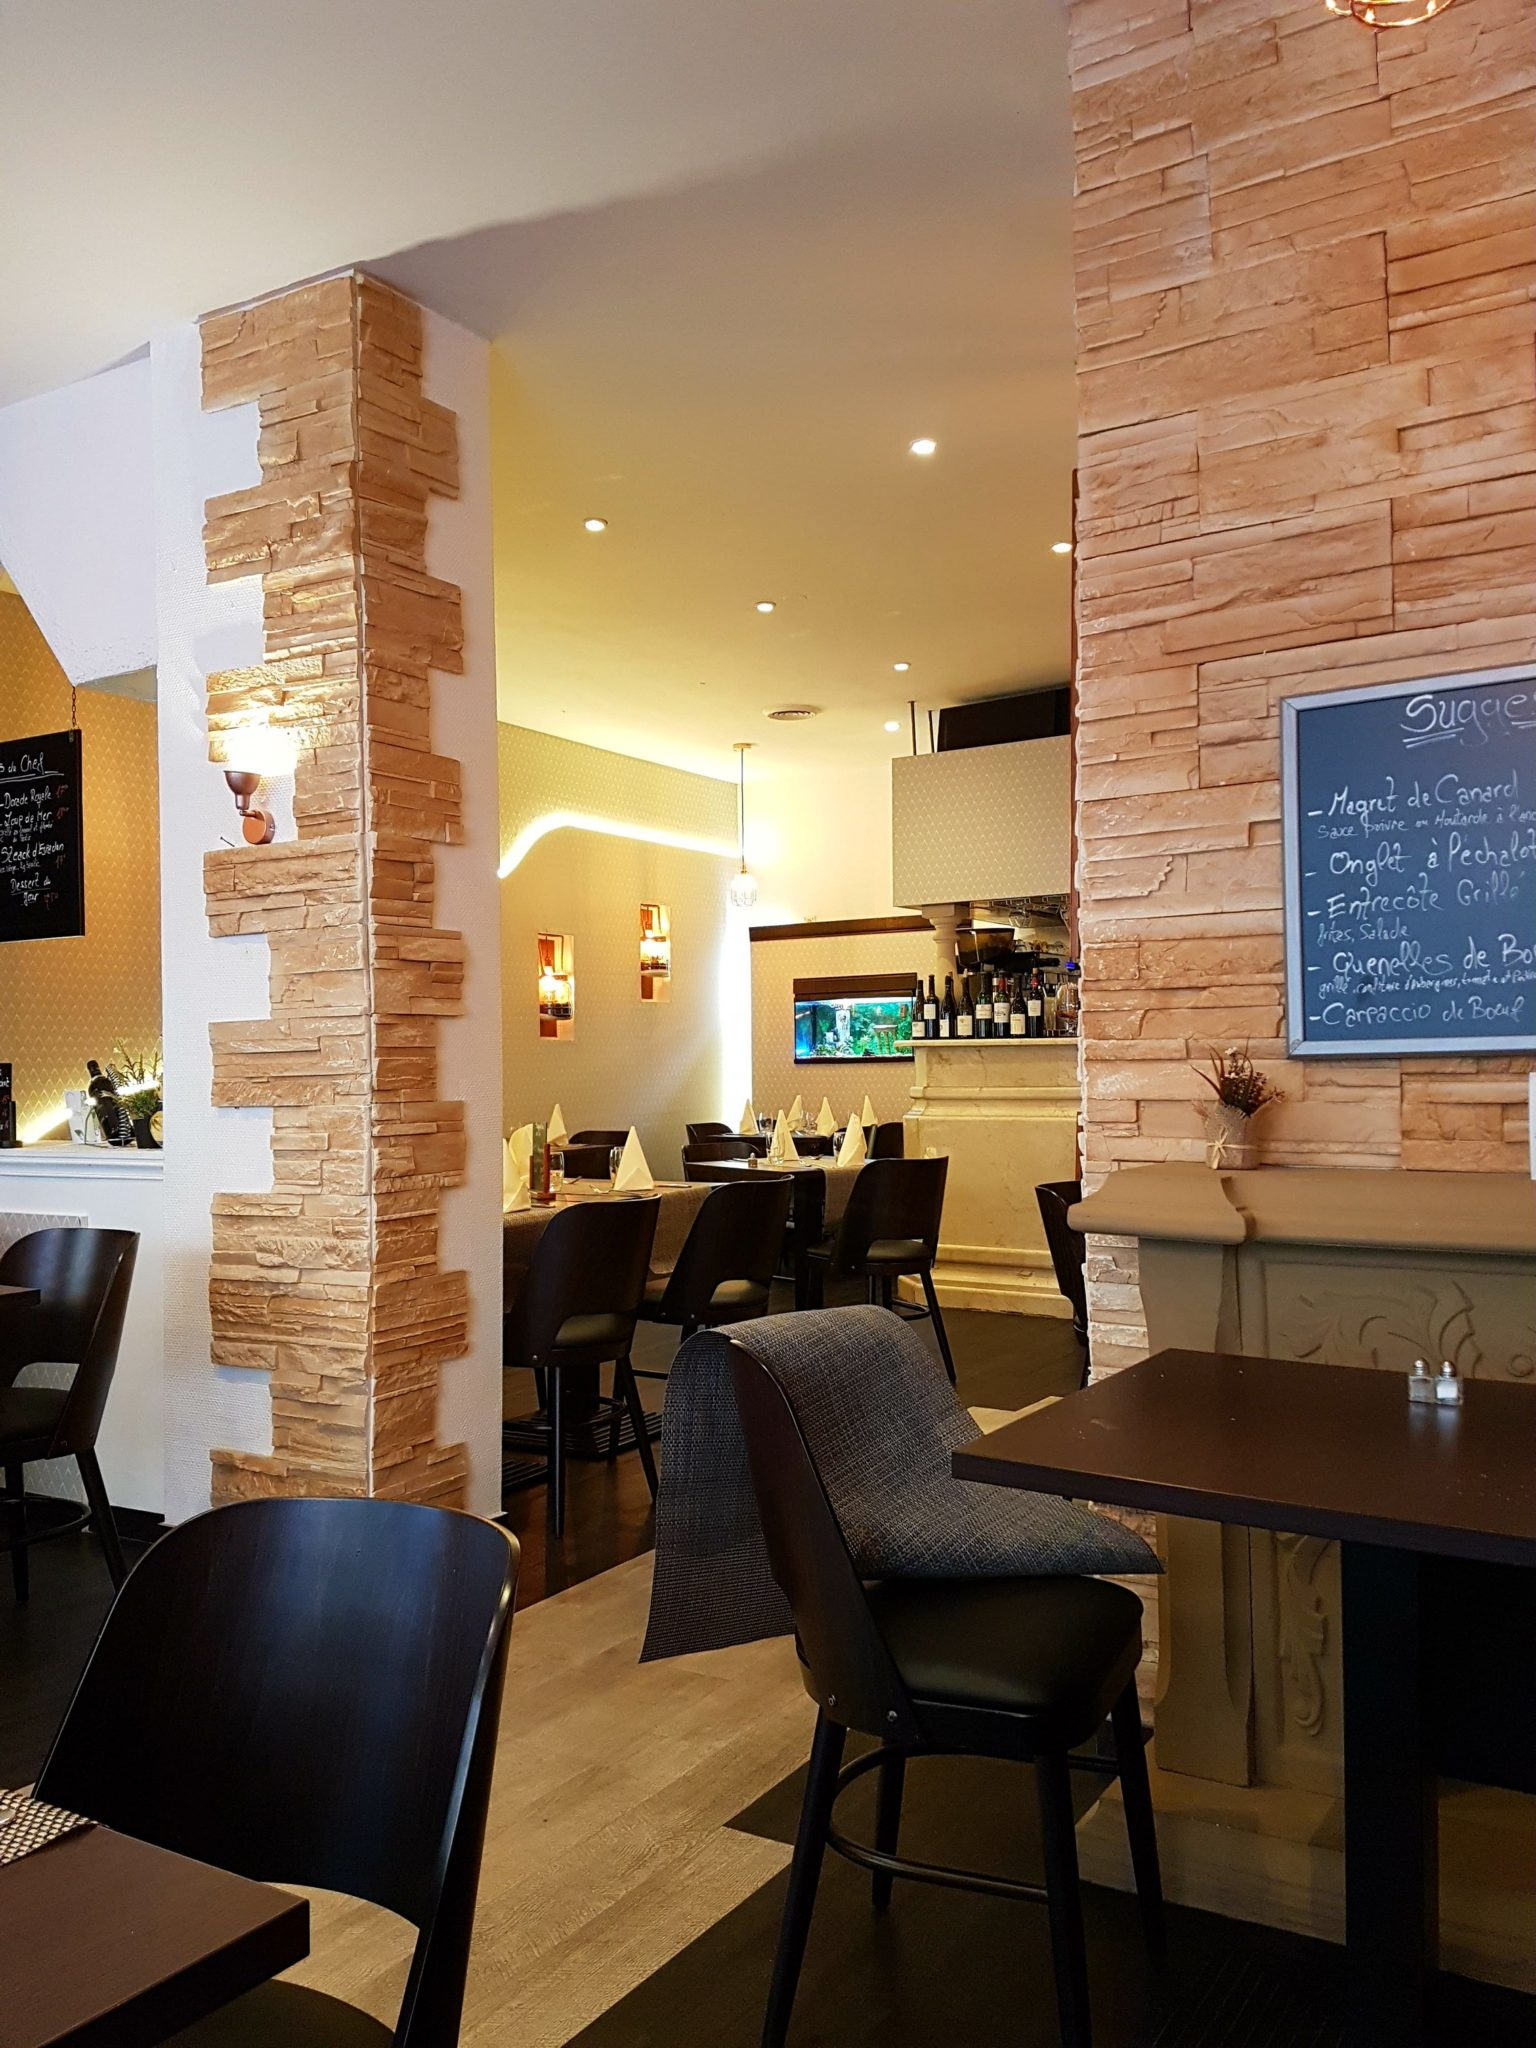 kapou test n 140 la baie des anges restaurant sauv par. Black Bedroom Furniture Sets. Home Design Ideas